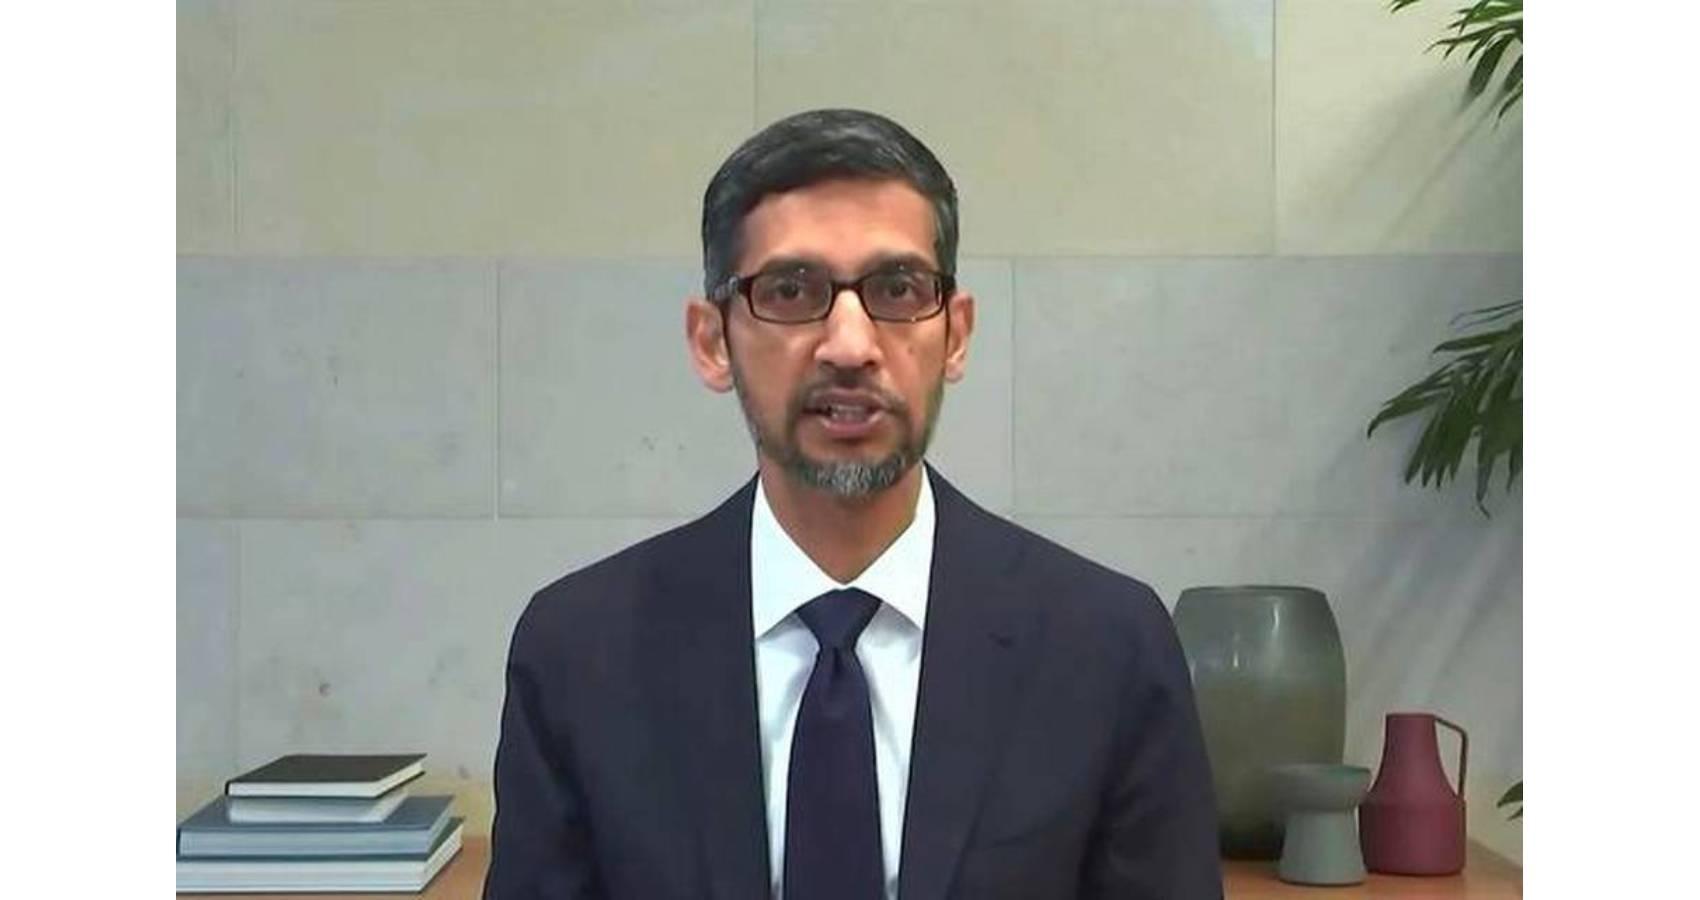 Free, Open Social Media Under Attack, Says Google Chief Sundar Pichai